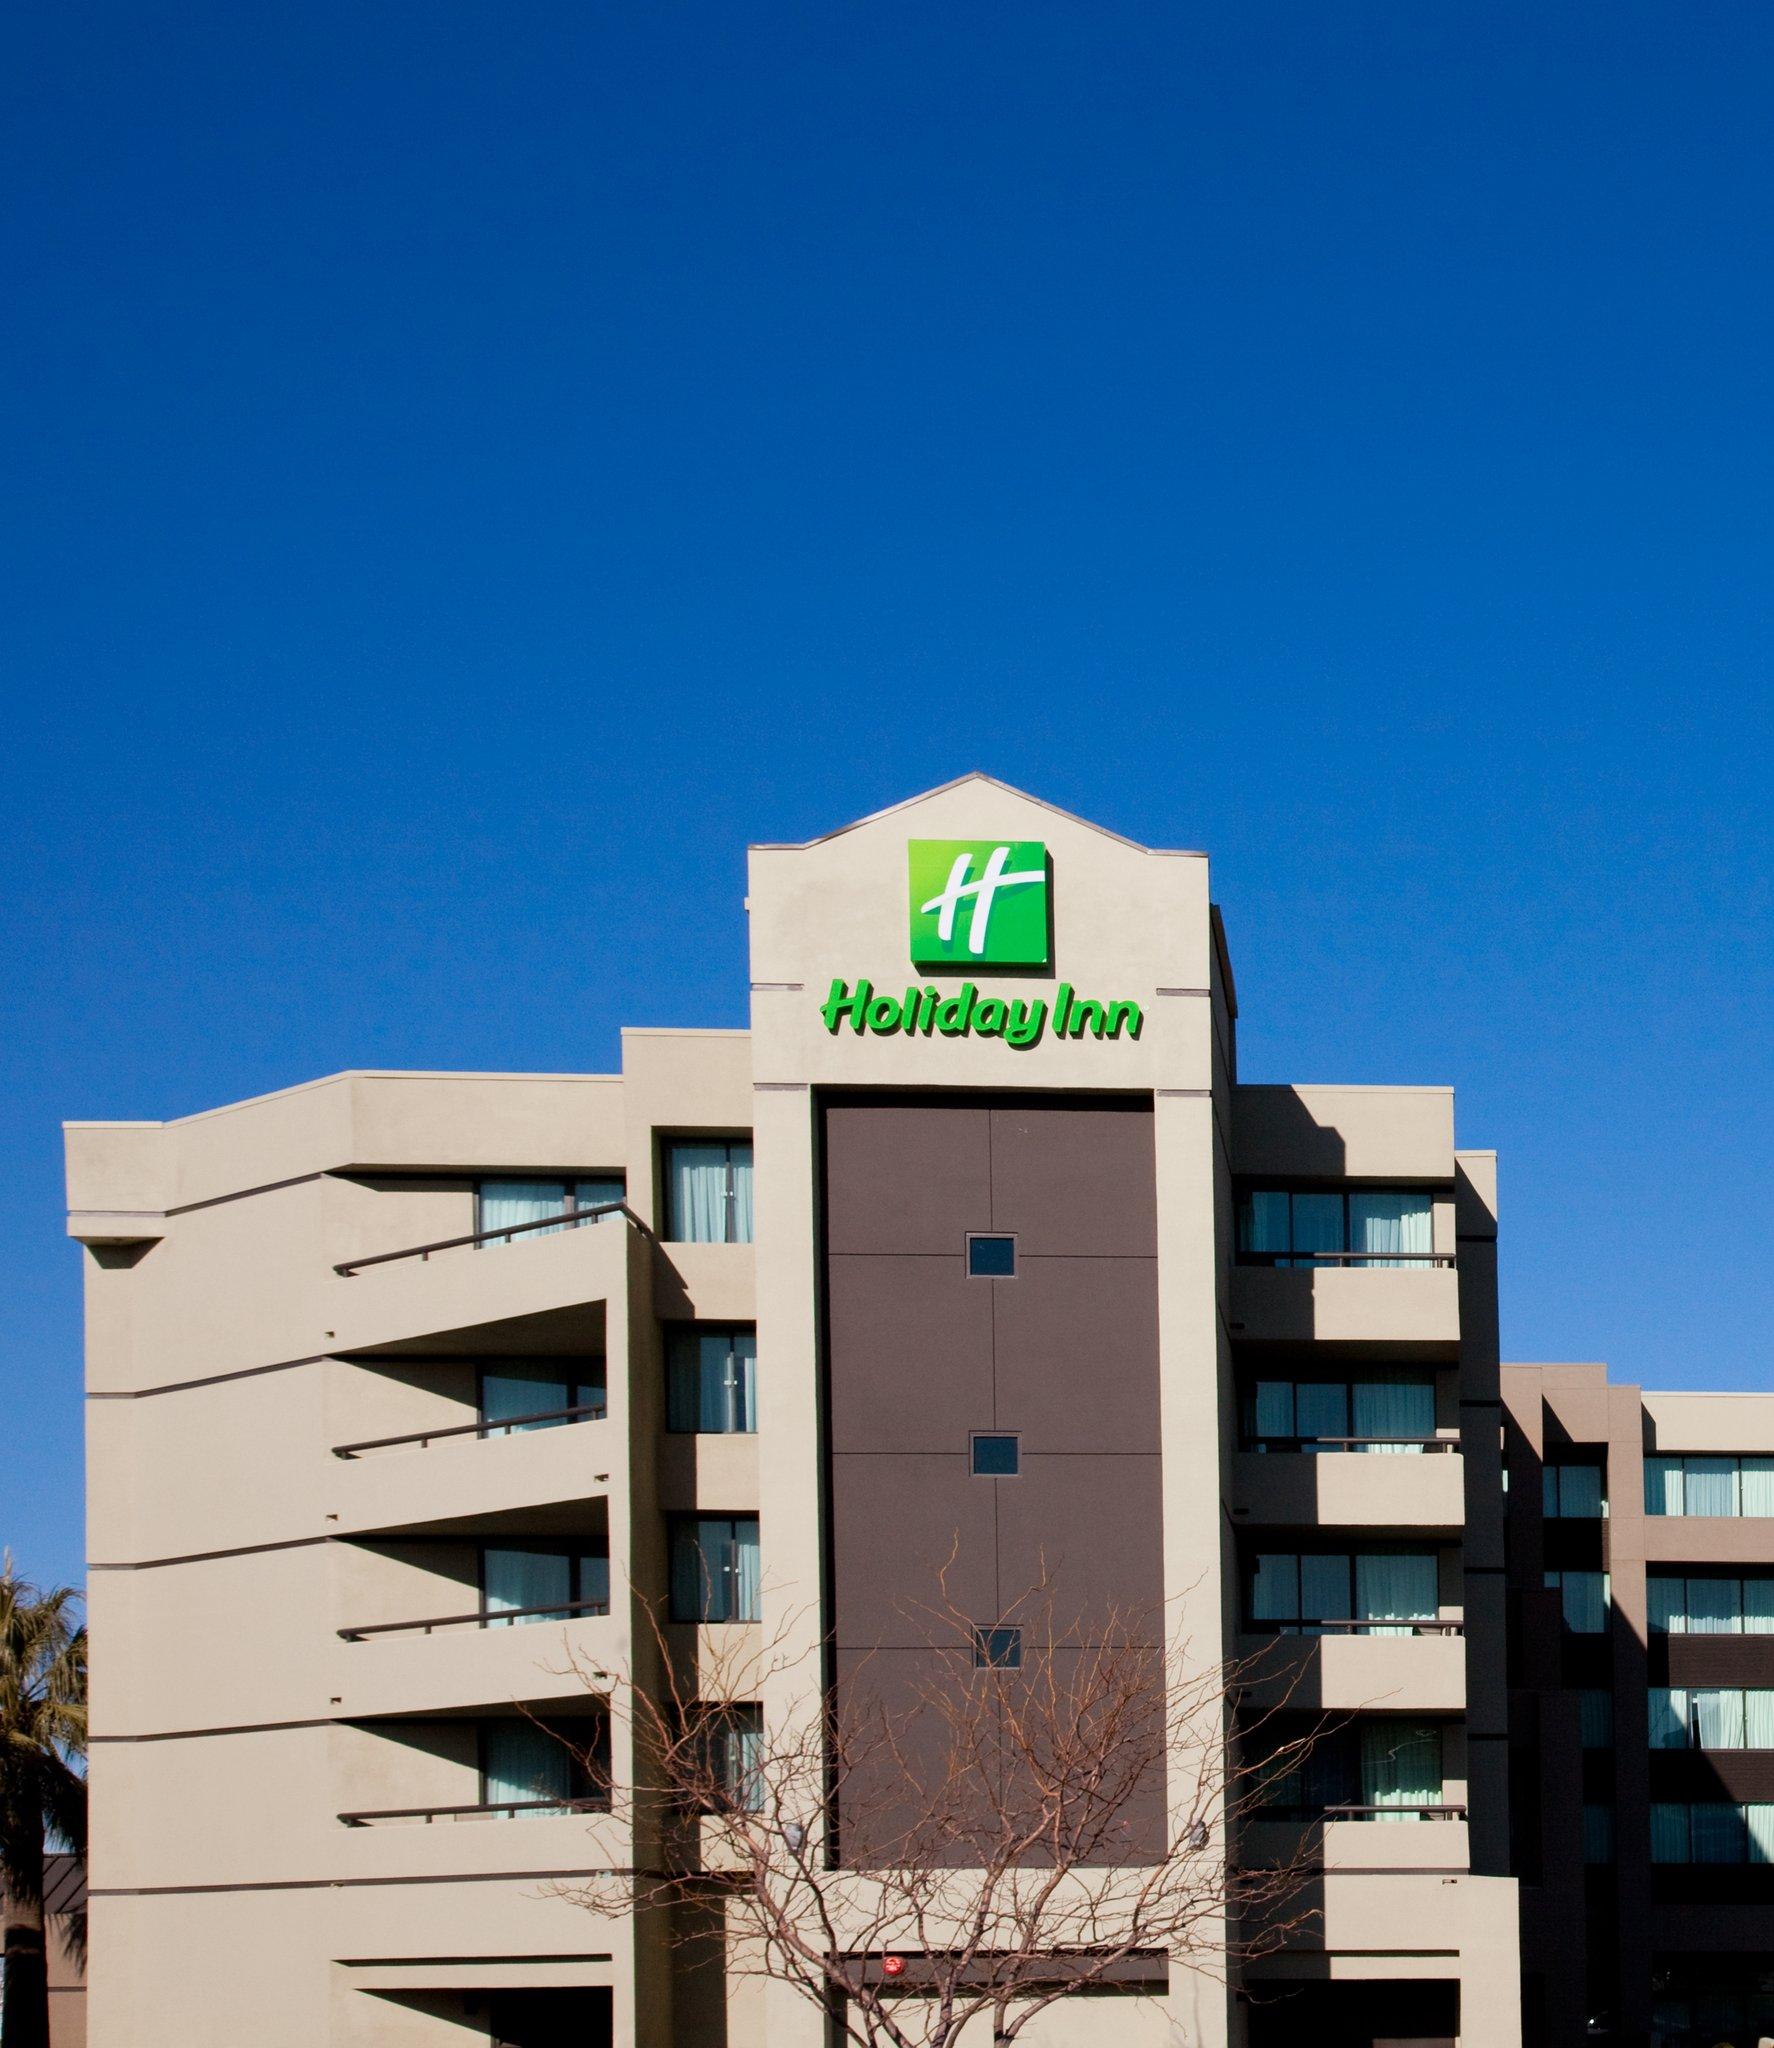 Holiday Inn Palmdale